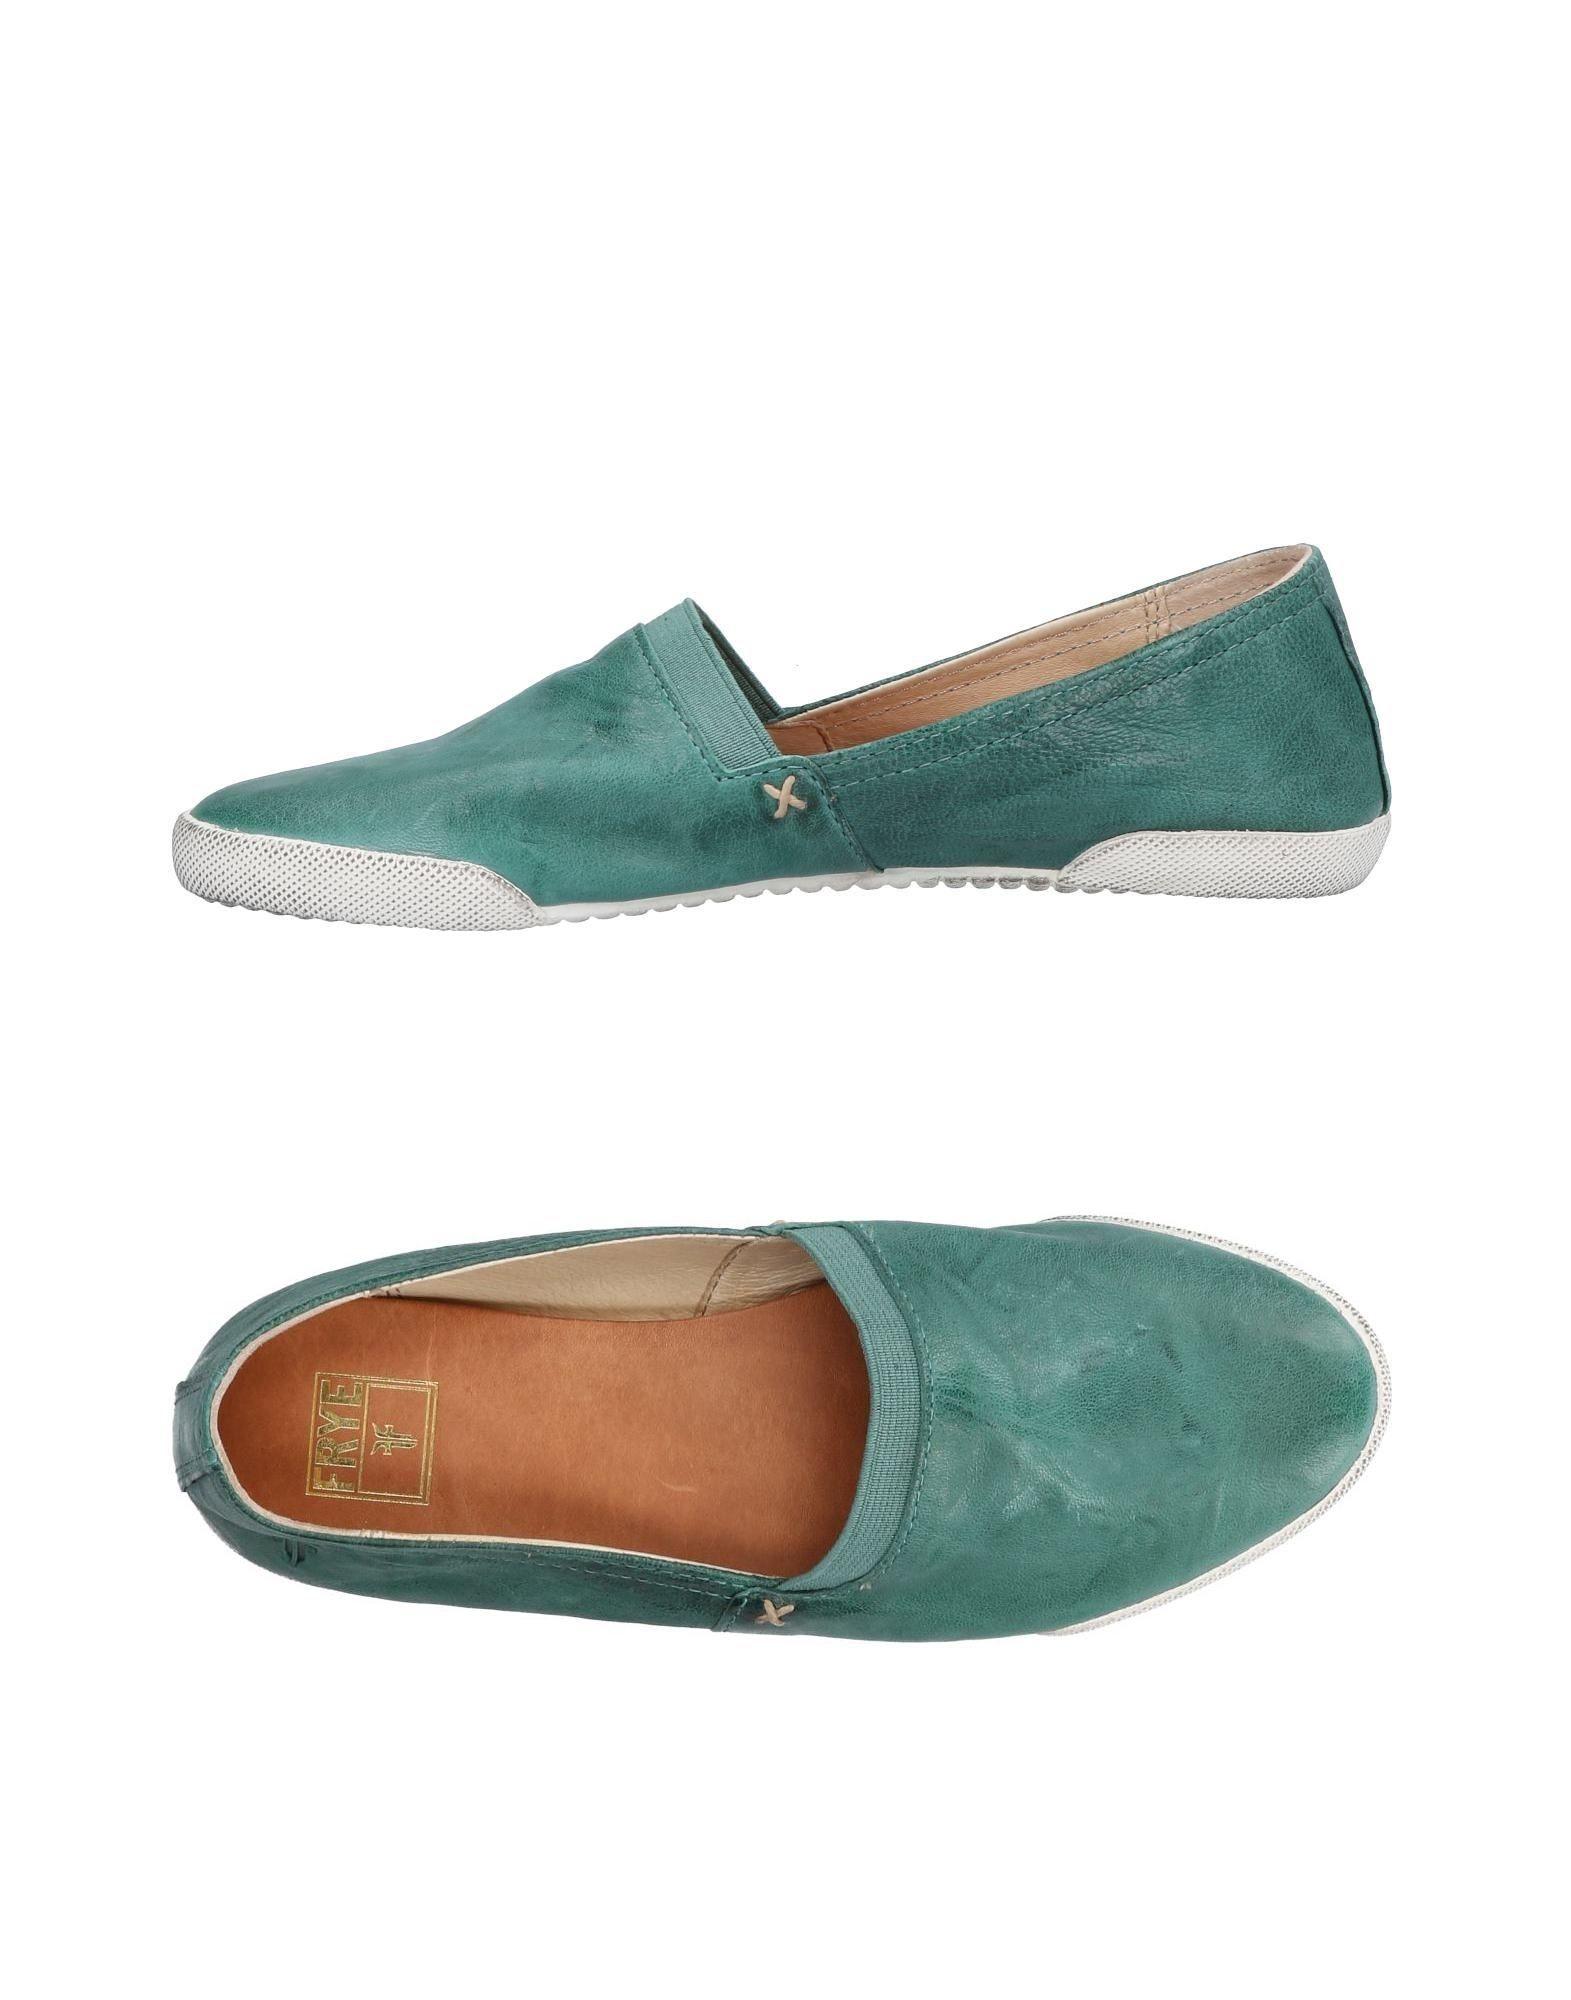 Frye Sneakers Damen  11432908OT Gute Qualität beliebte Schuhe